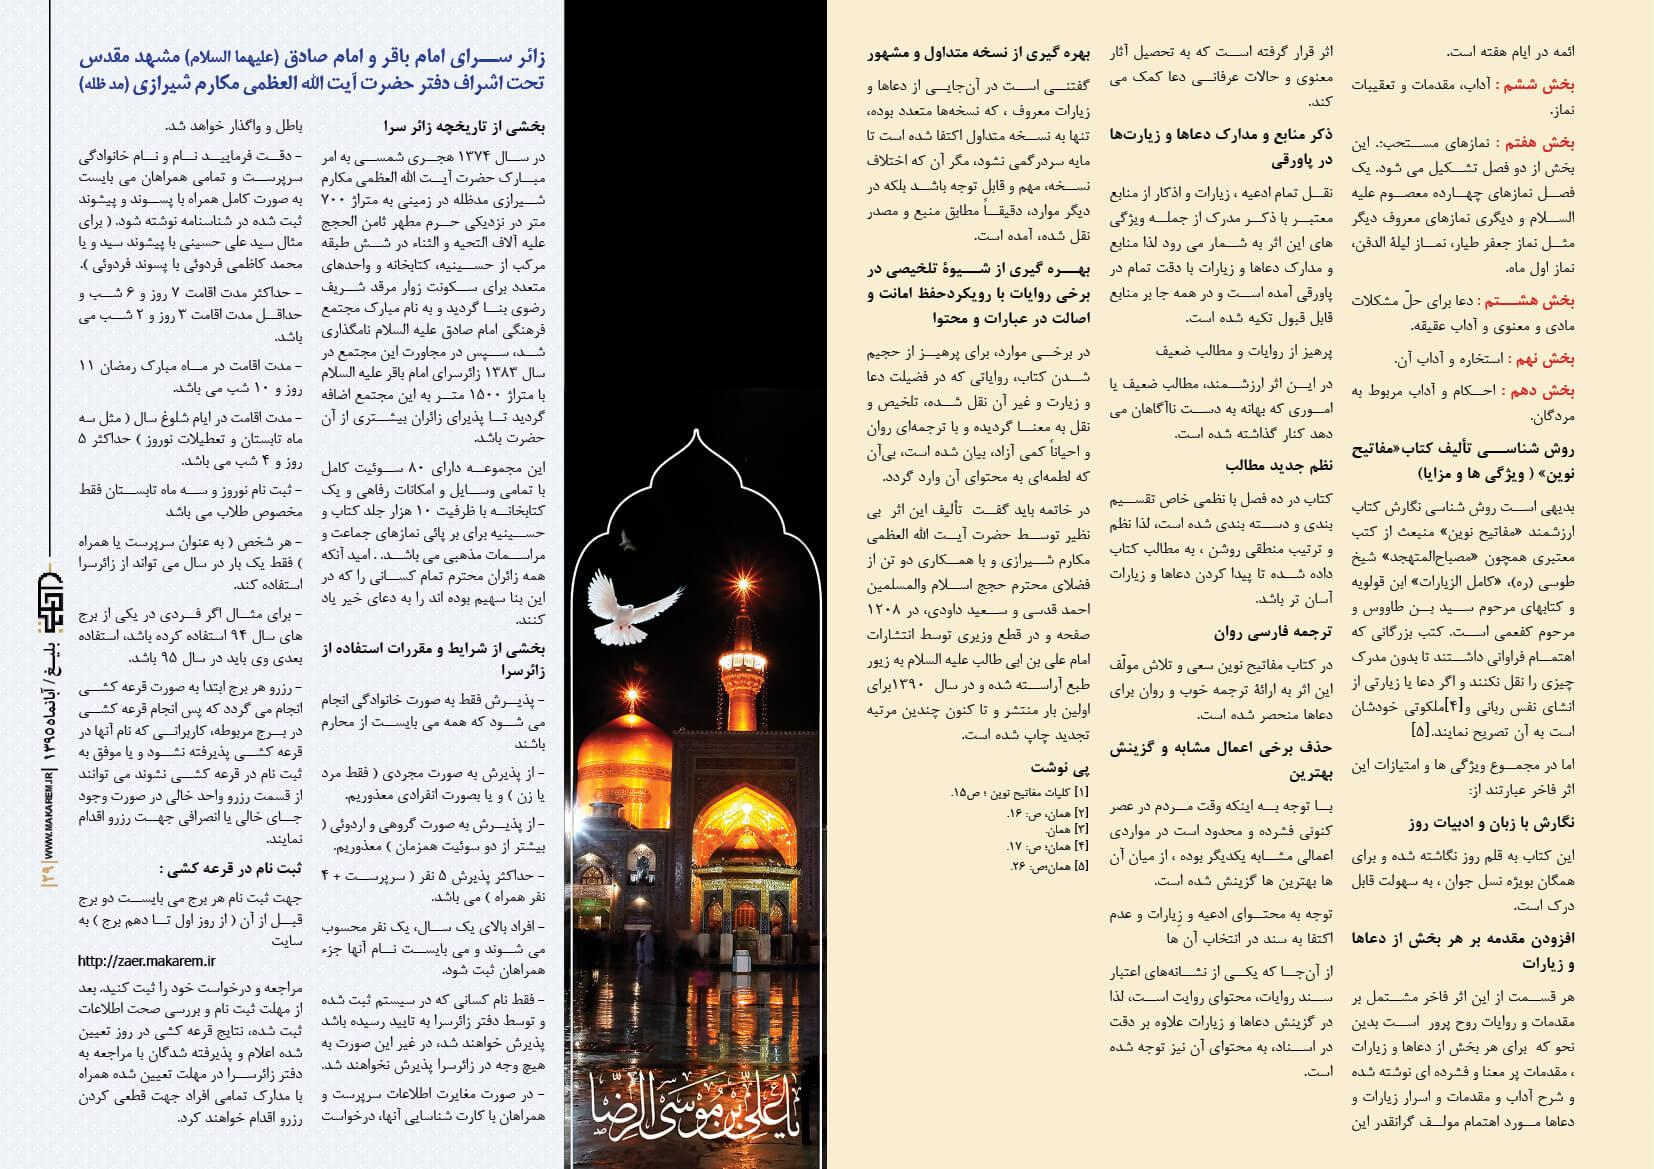 زائر سرای امام باقر و امام صادق علیهما السلام مشهد مقدس-مدرسه الامام امیر المومنین (ع)